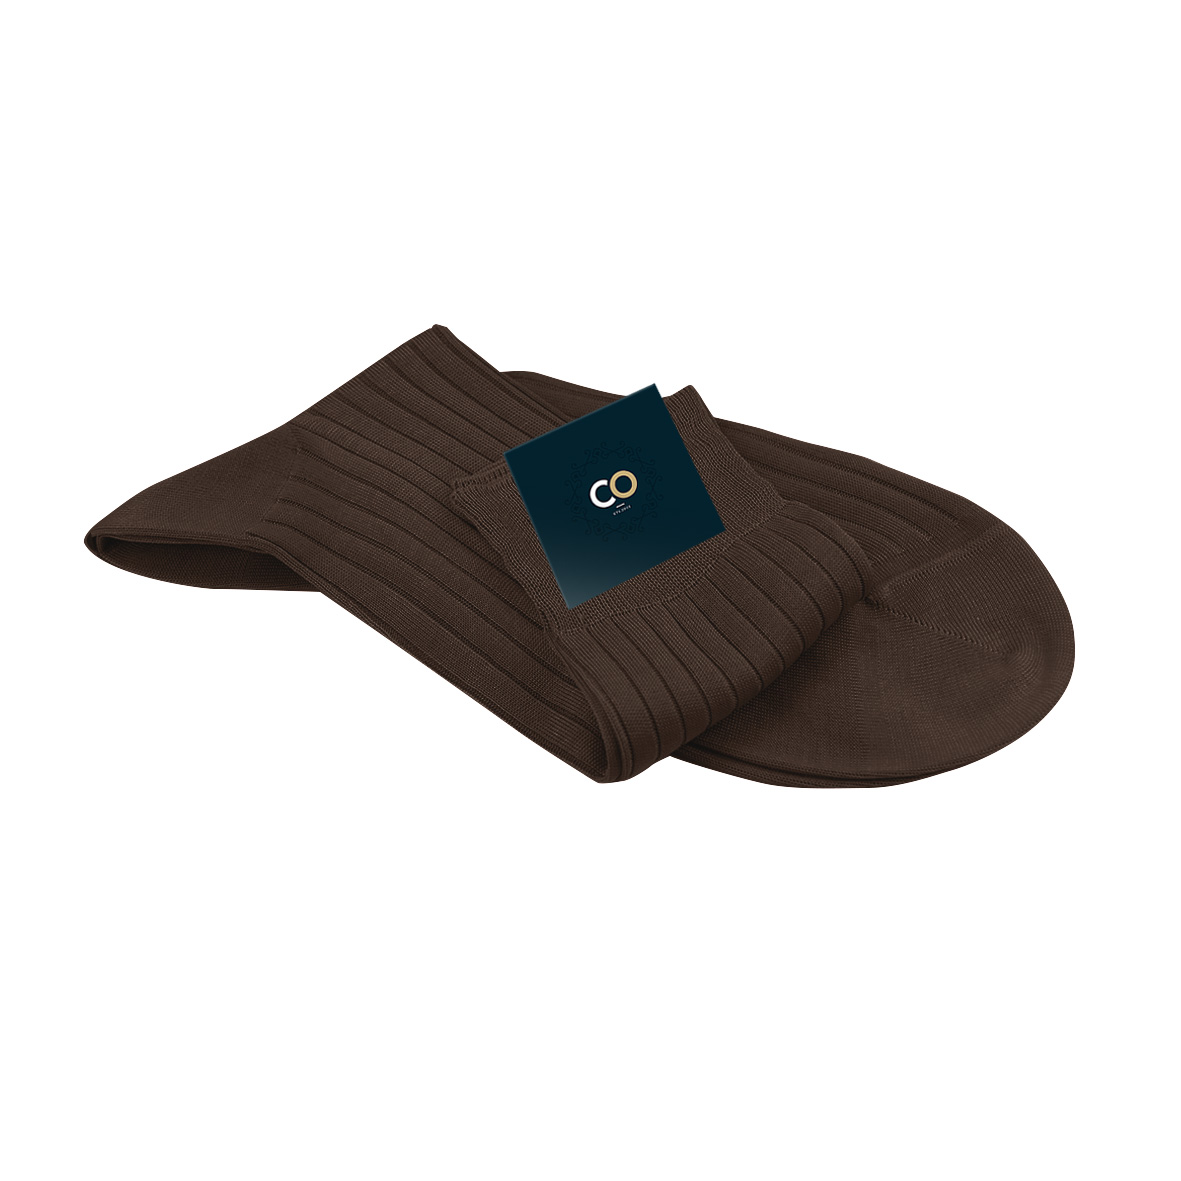 Medard, Marron chocolat